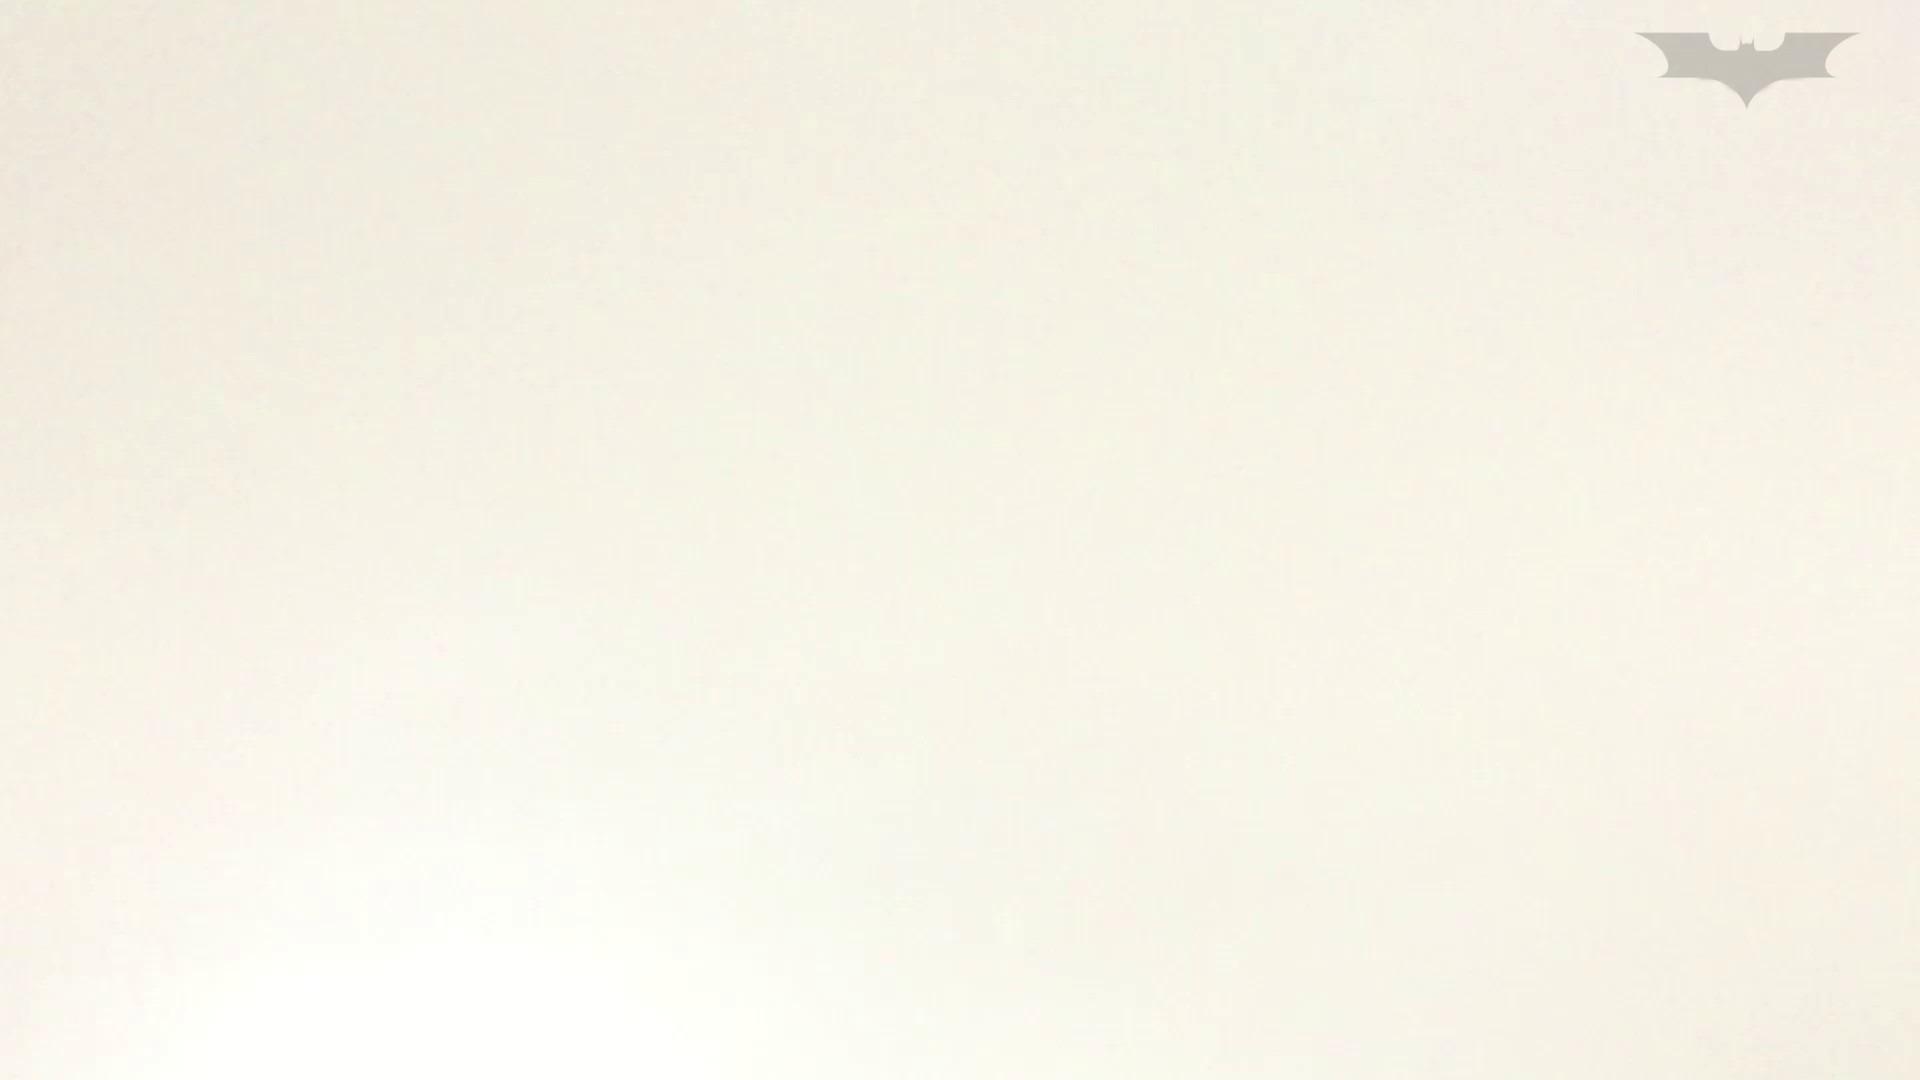 JD盗撮 美女の洗面所の秘密 Vol.67 盗撮で悶絶 ぱこり動画紹介 55画像 47